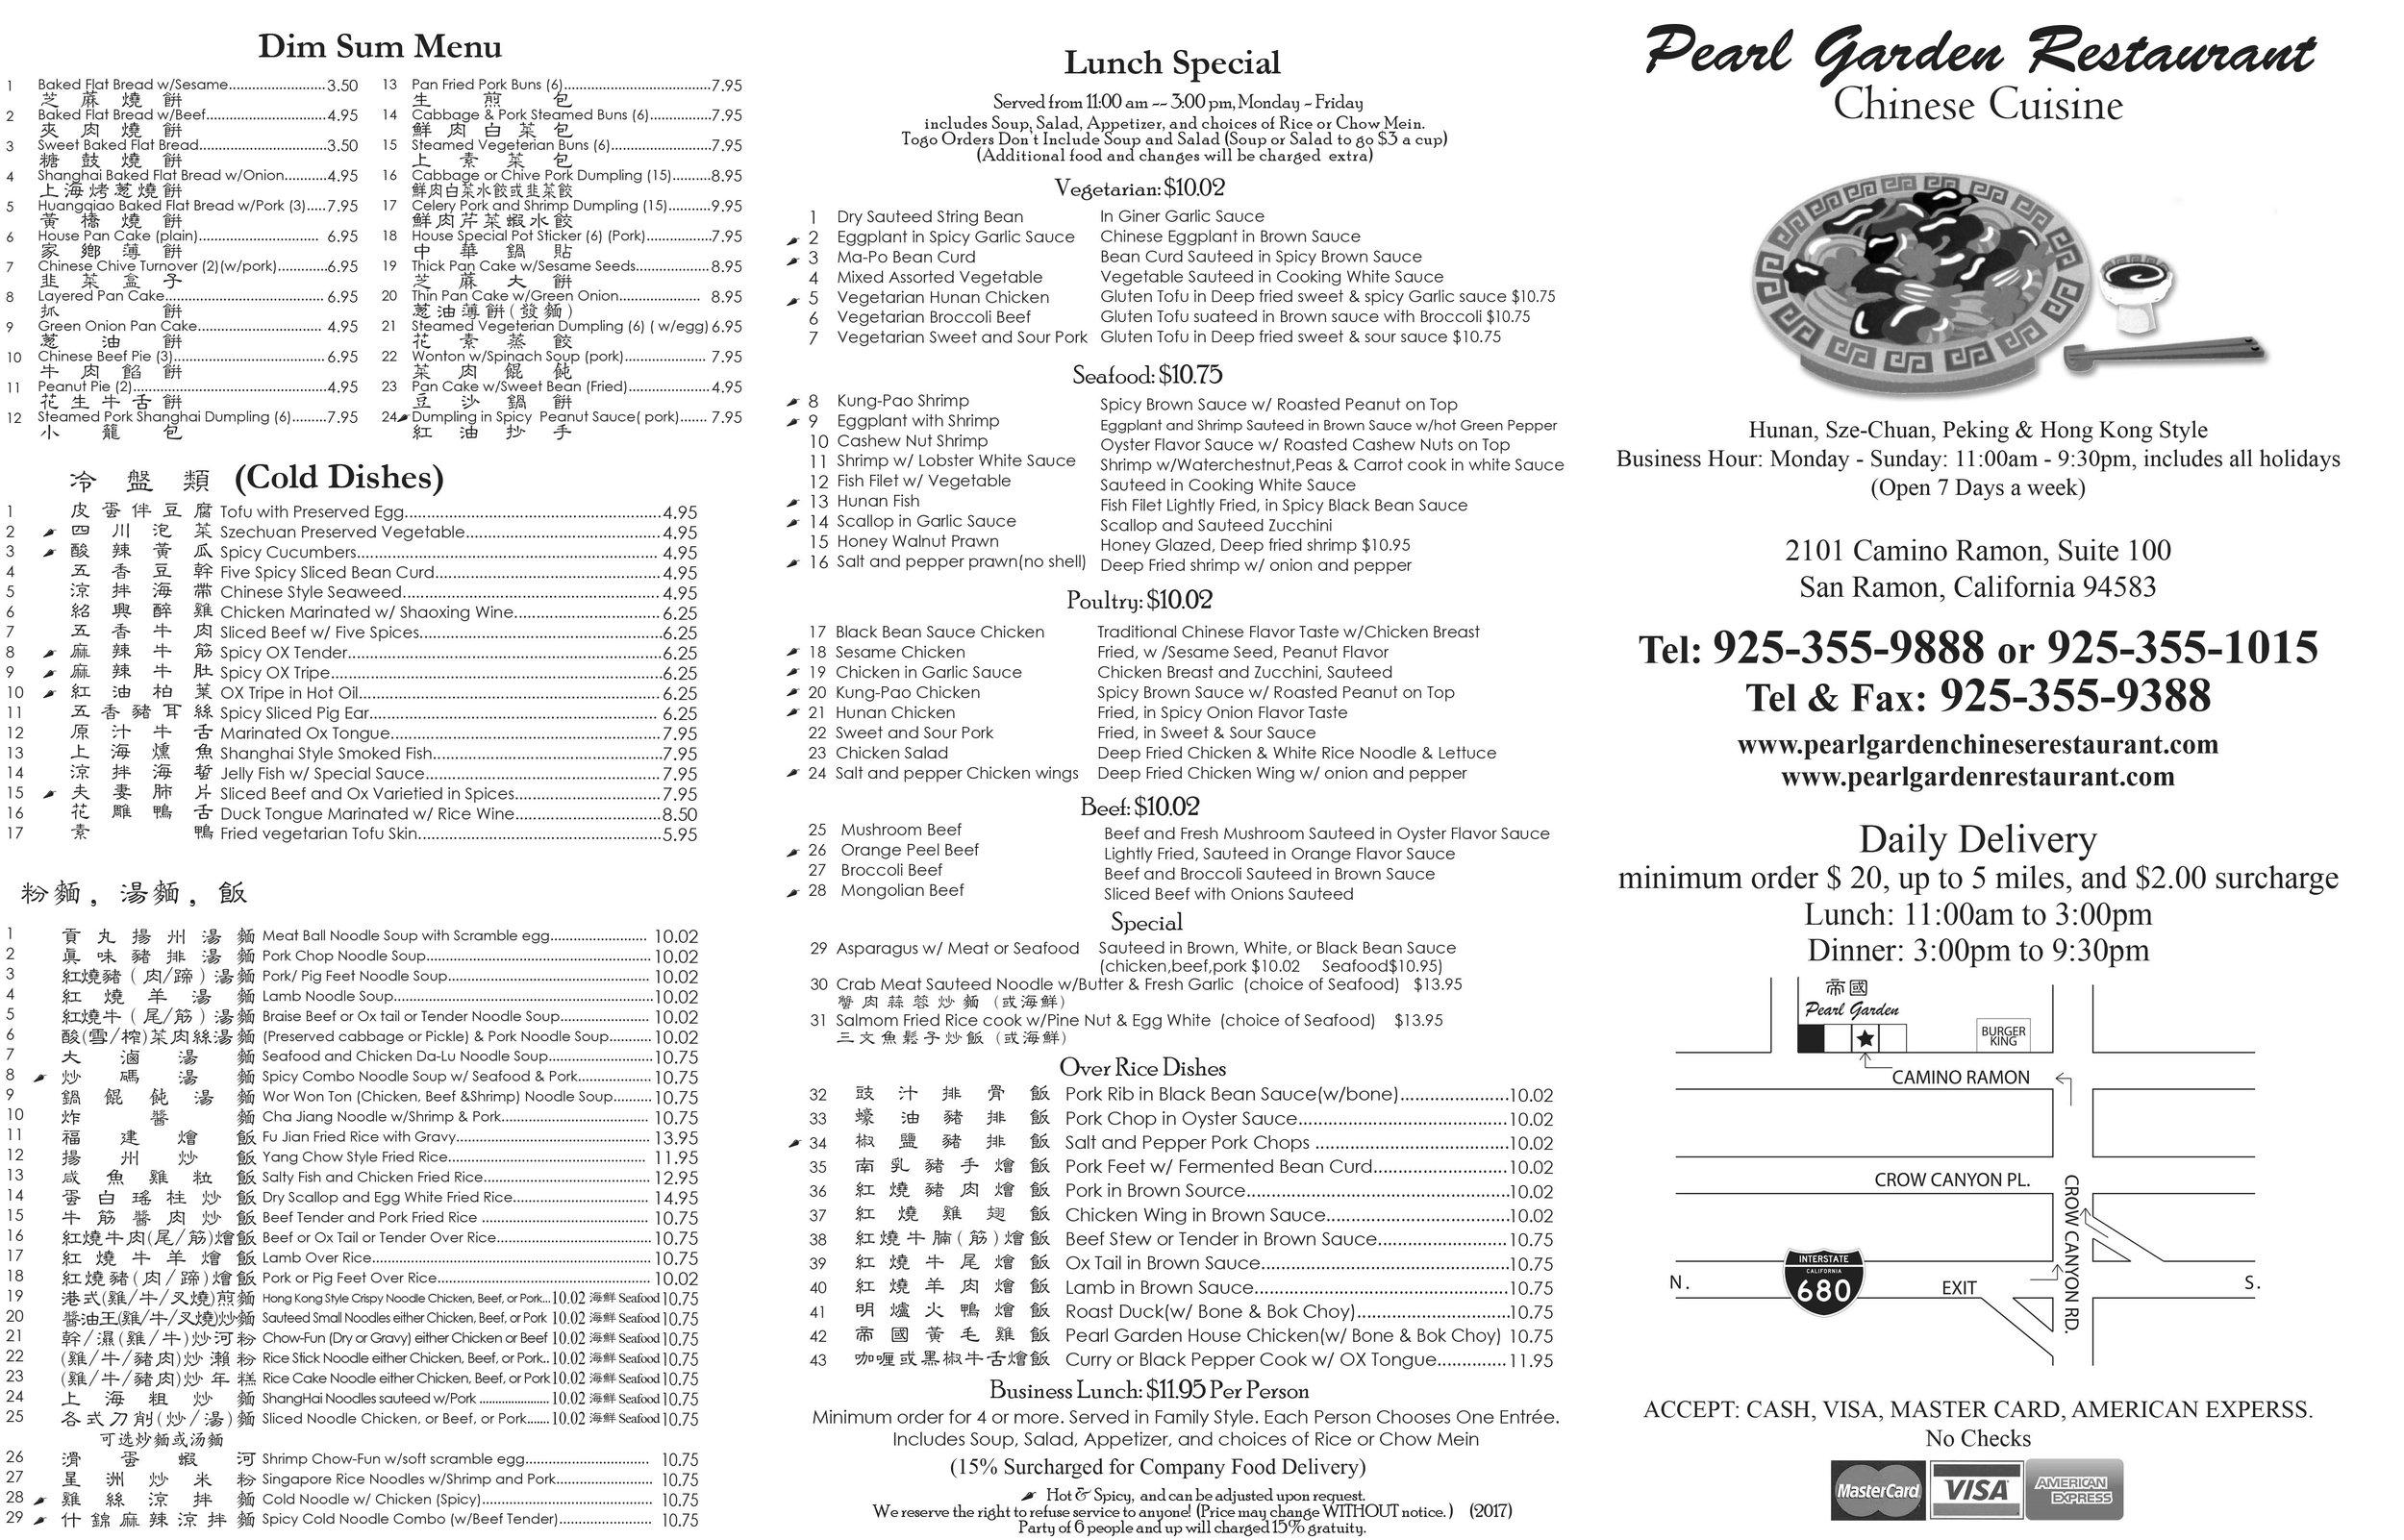 To-Go \u2014 Pearl Garden Restaurant - restaurant to go menu